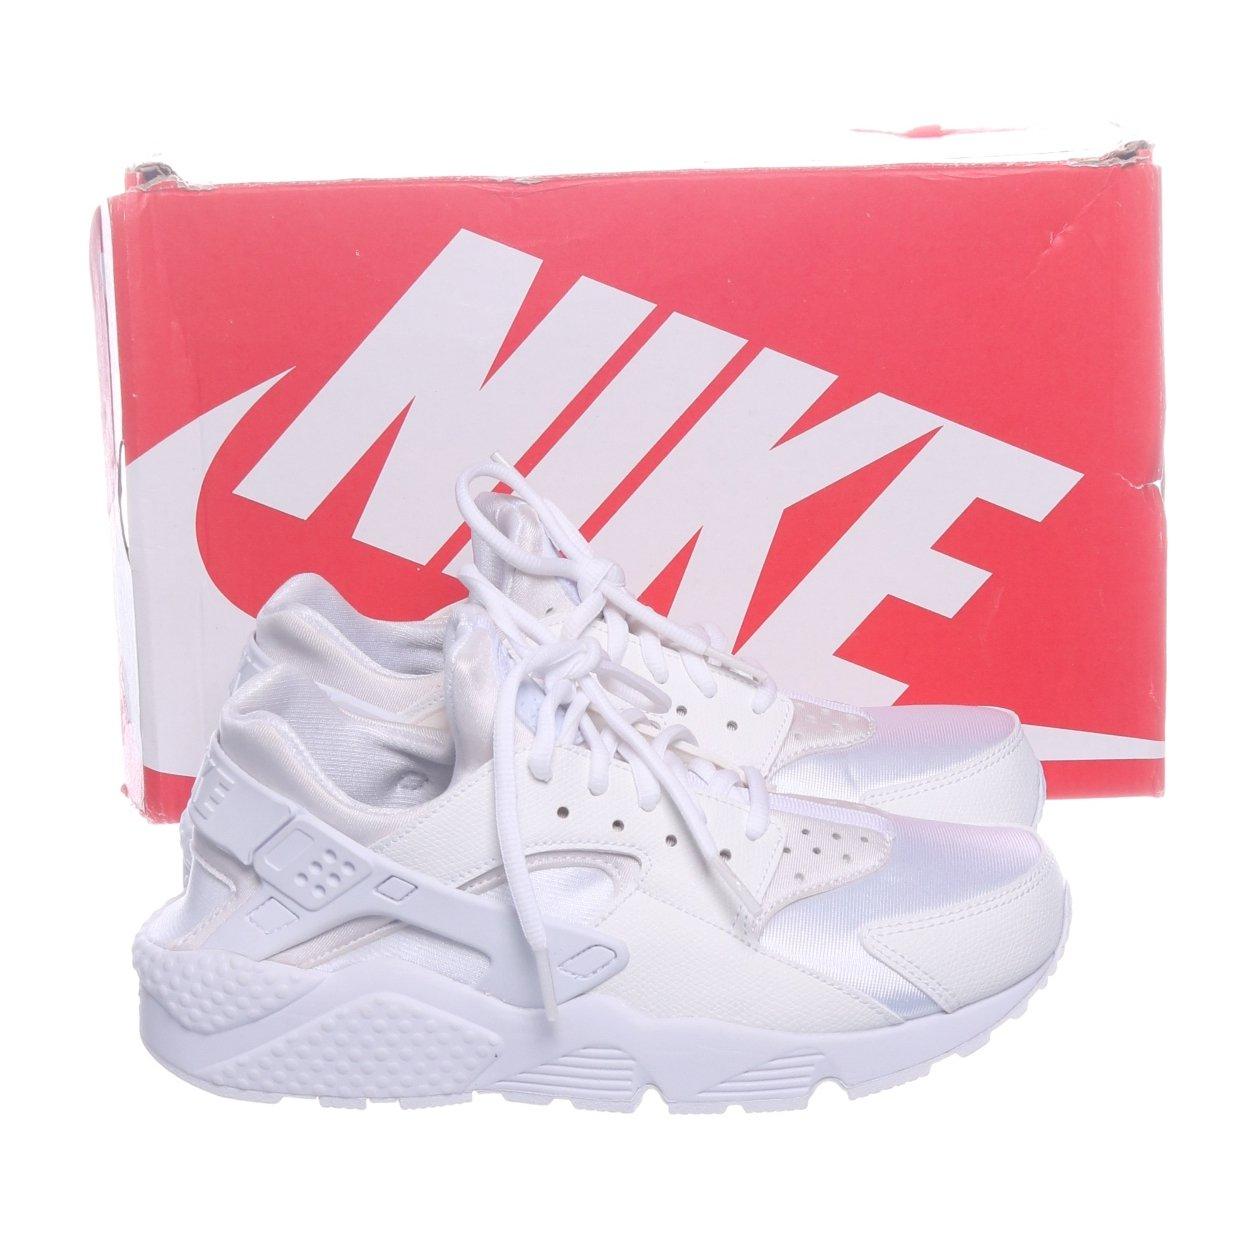 online retailer cd0ce 95893 Nike, Sneakers, Strl  39, Wmns Air Huarache Run, Vit